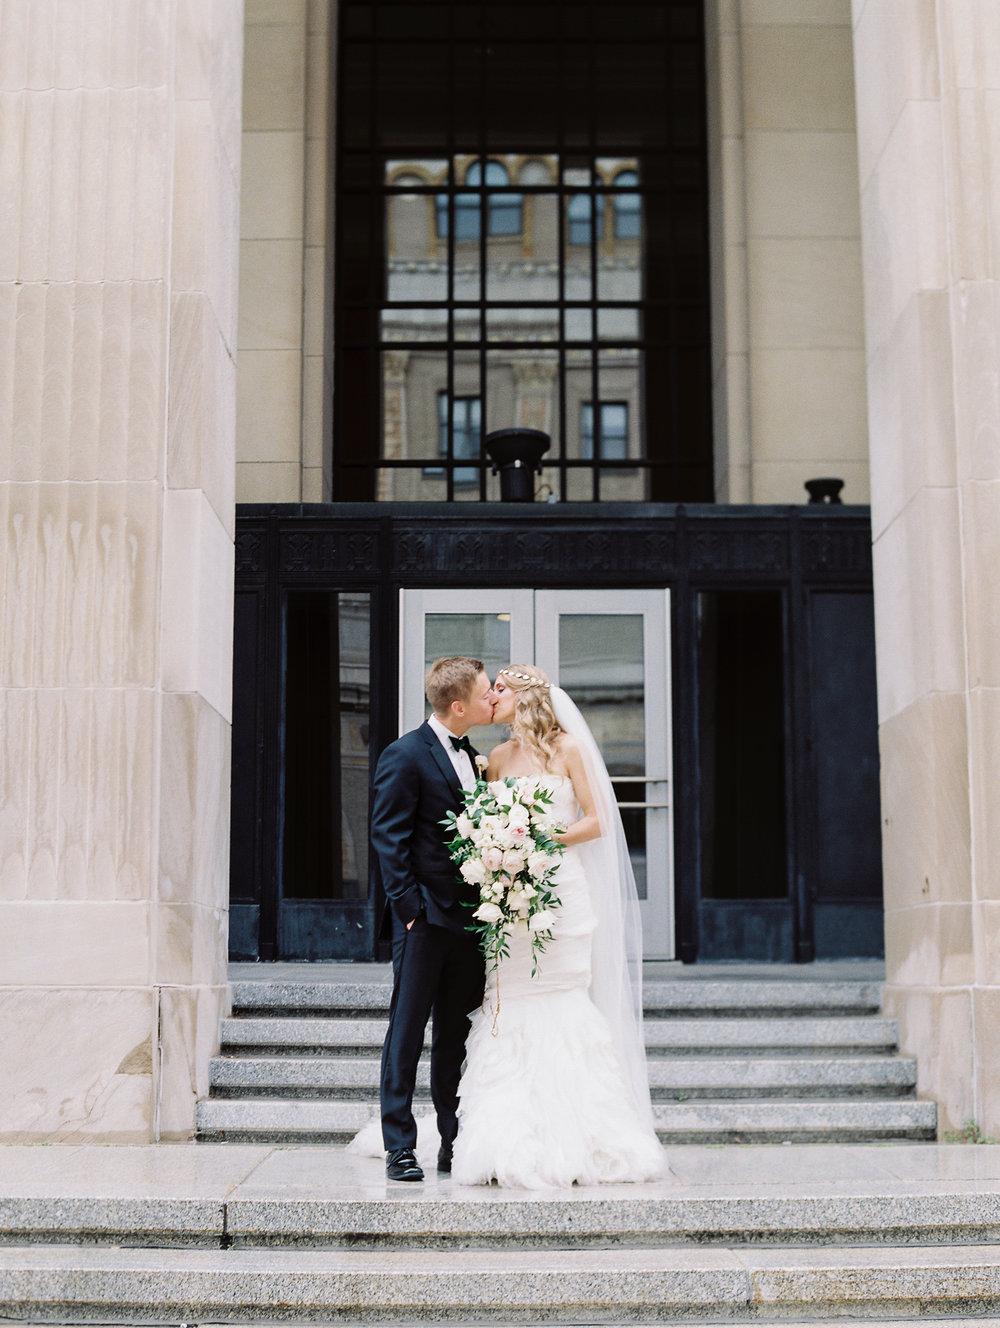 Zawisza Wedding f ASP©-4.jpg